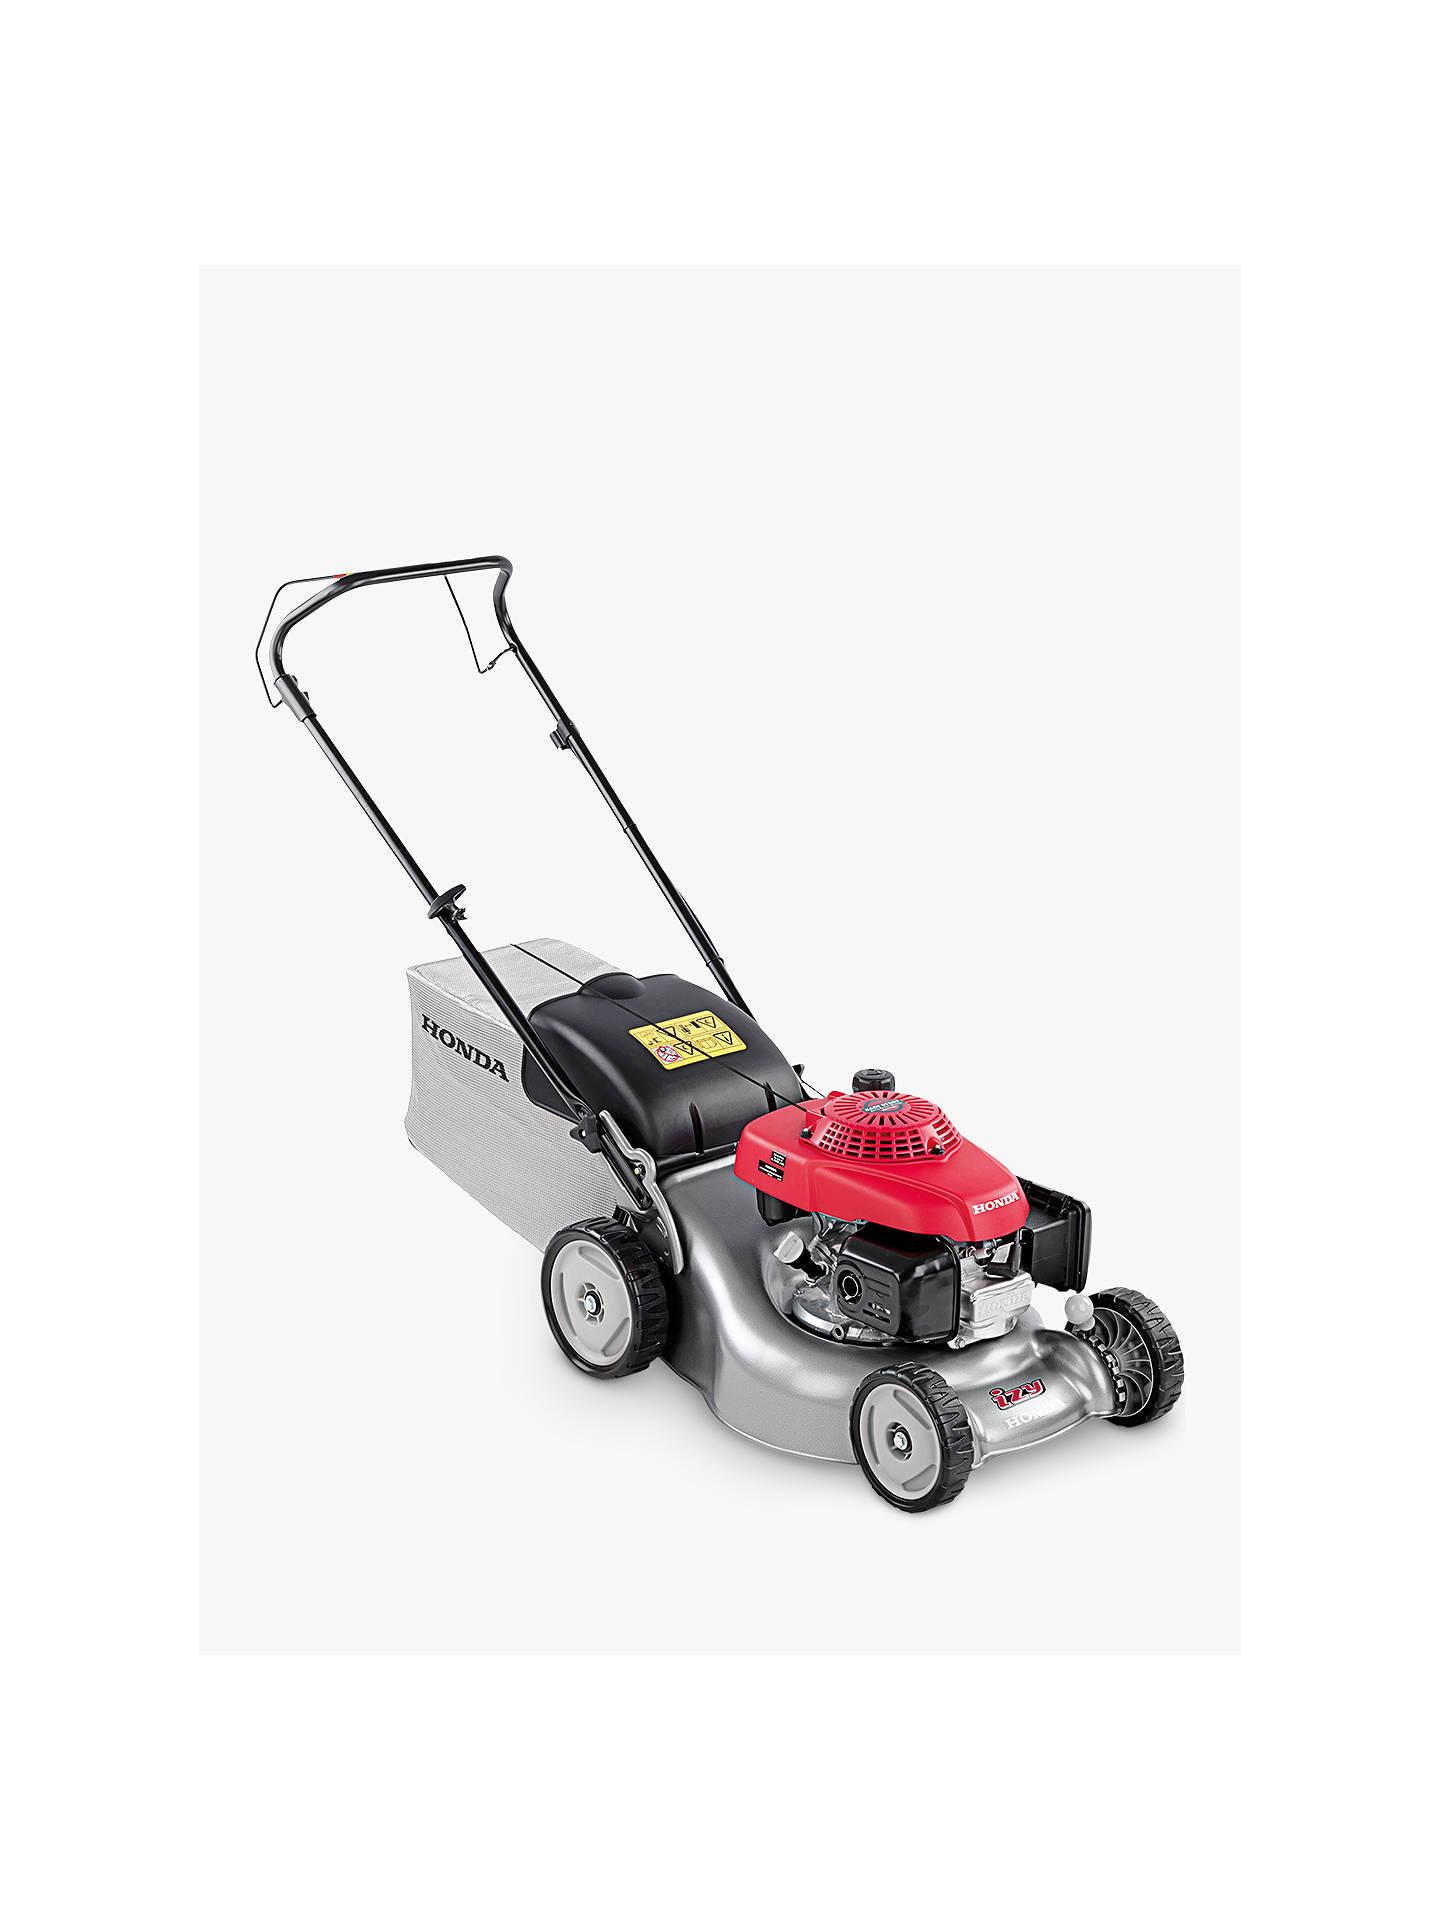 BuyHonda IZY HRG416PK Petrol Lawnmower Online at johnlewis.com